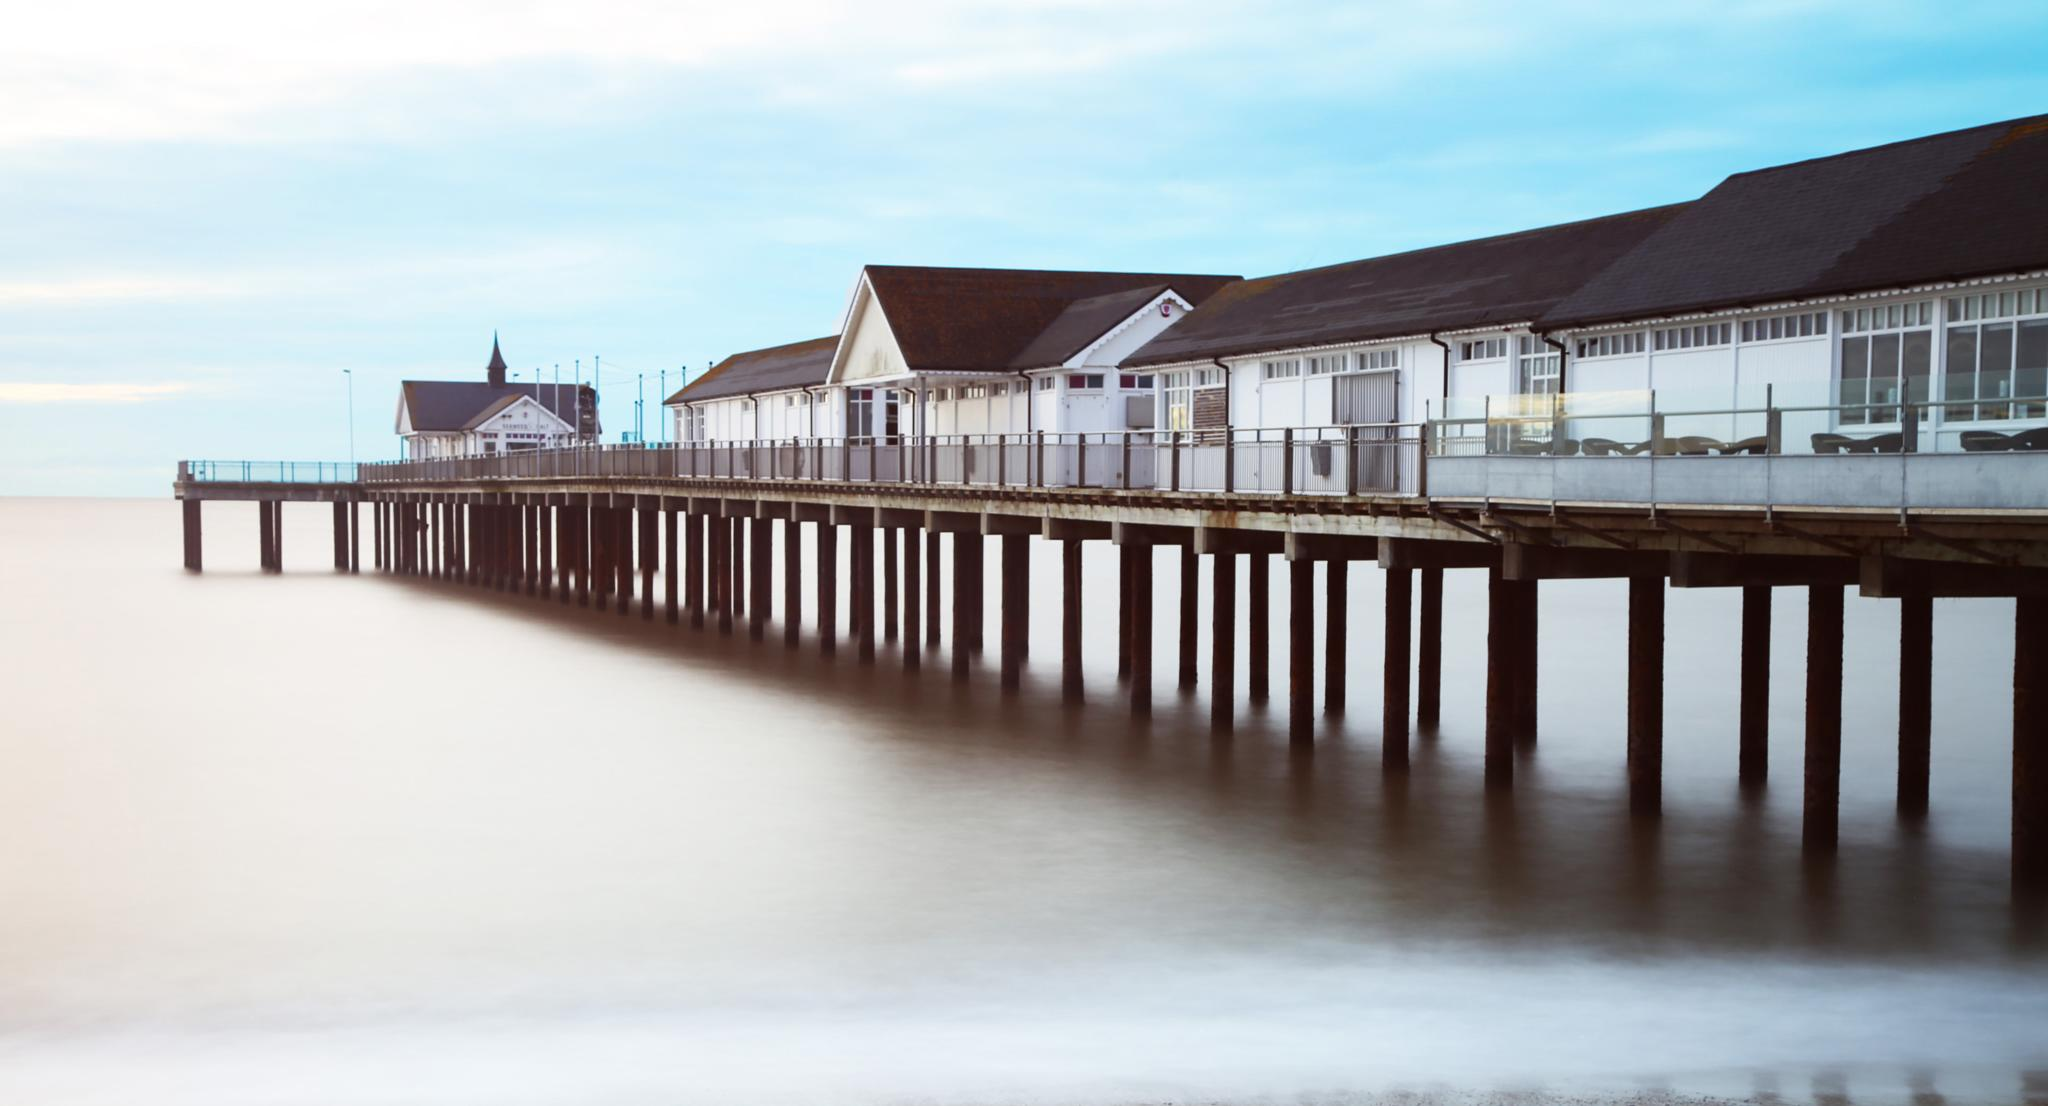 Southwold Pier 03 by Rich0077